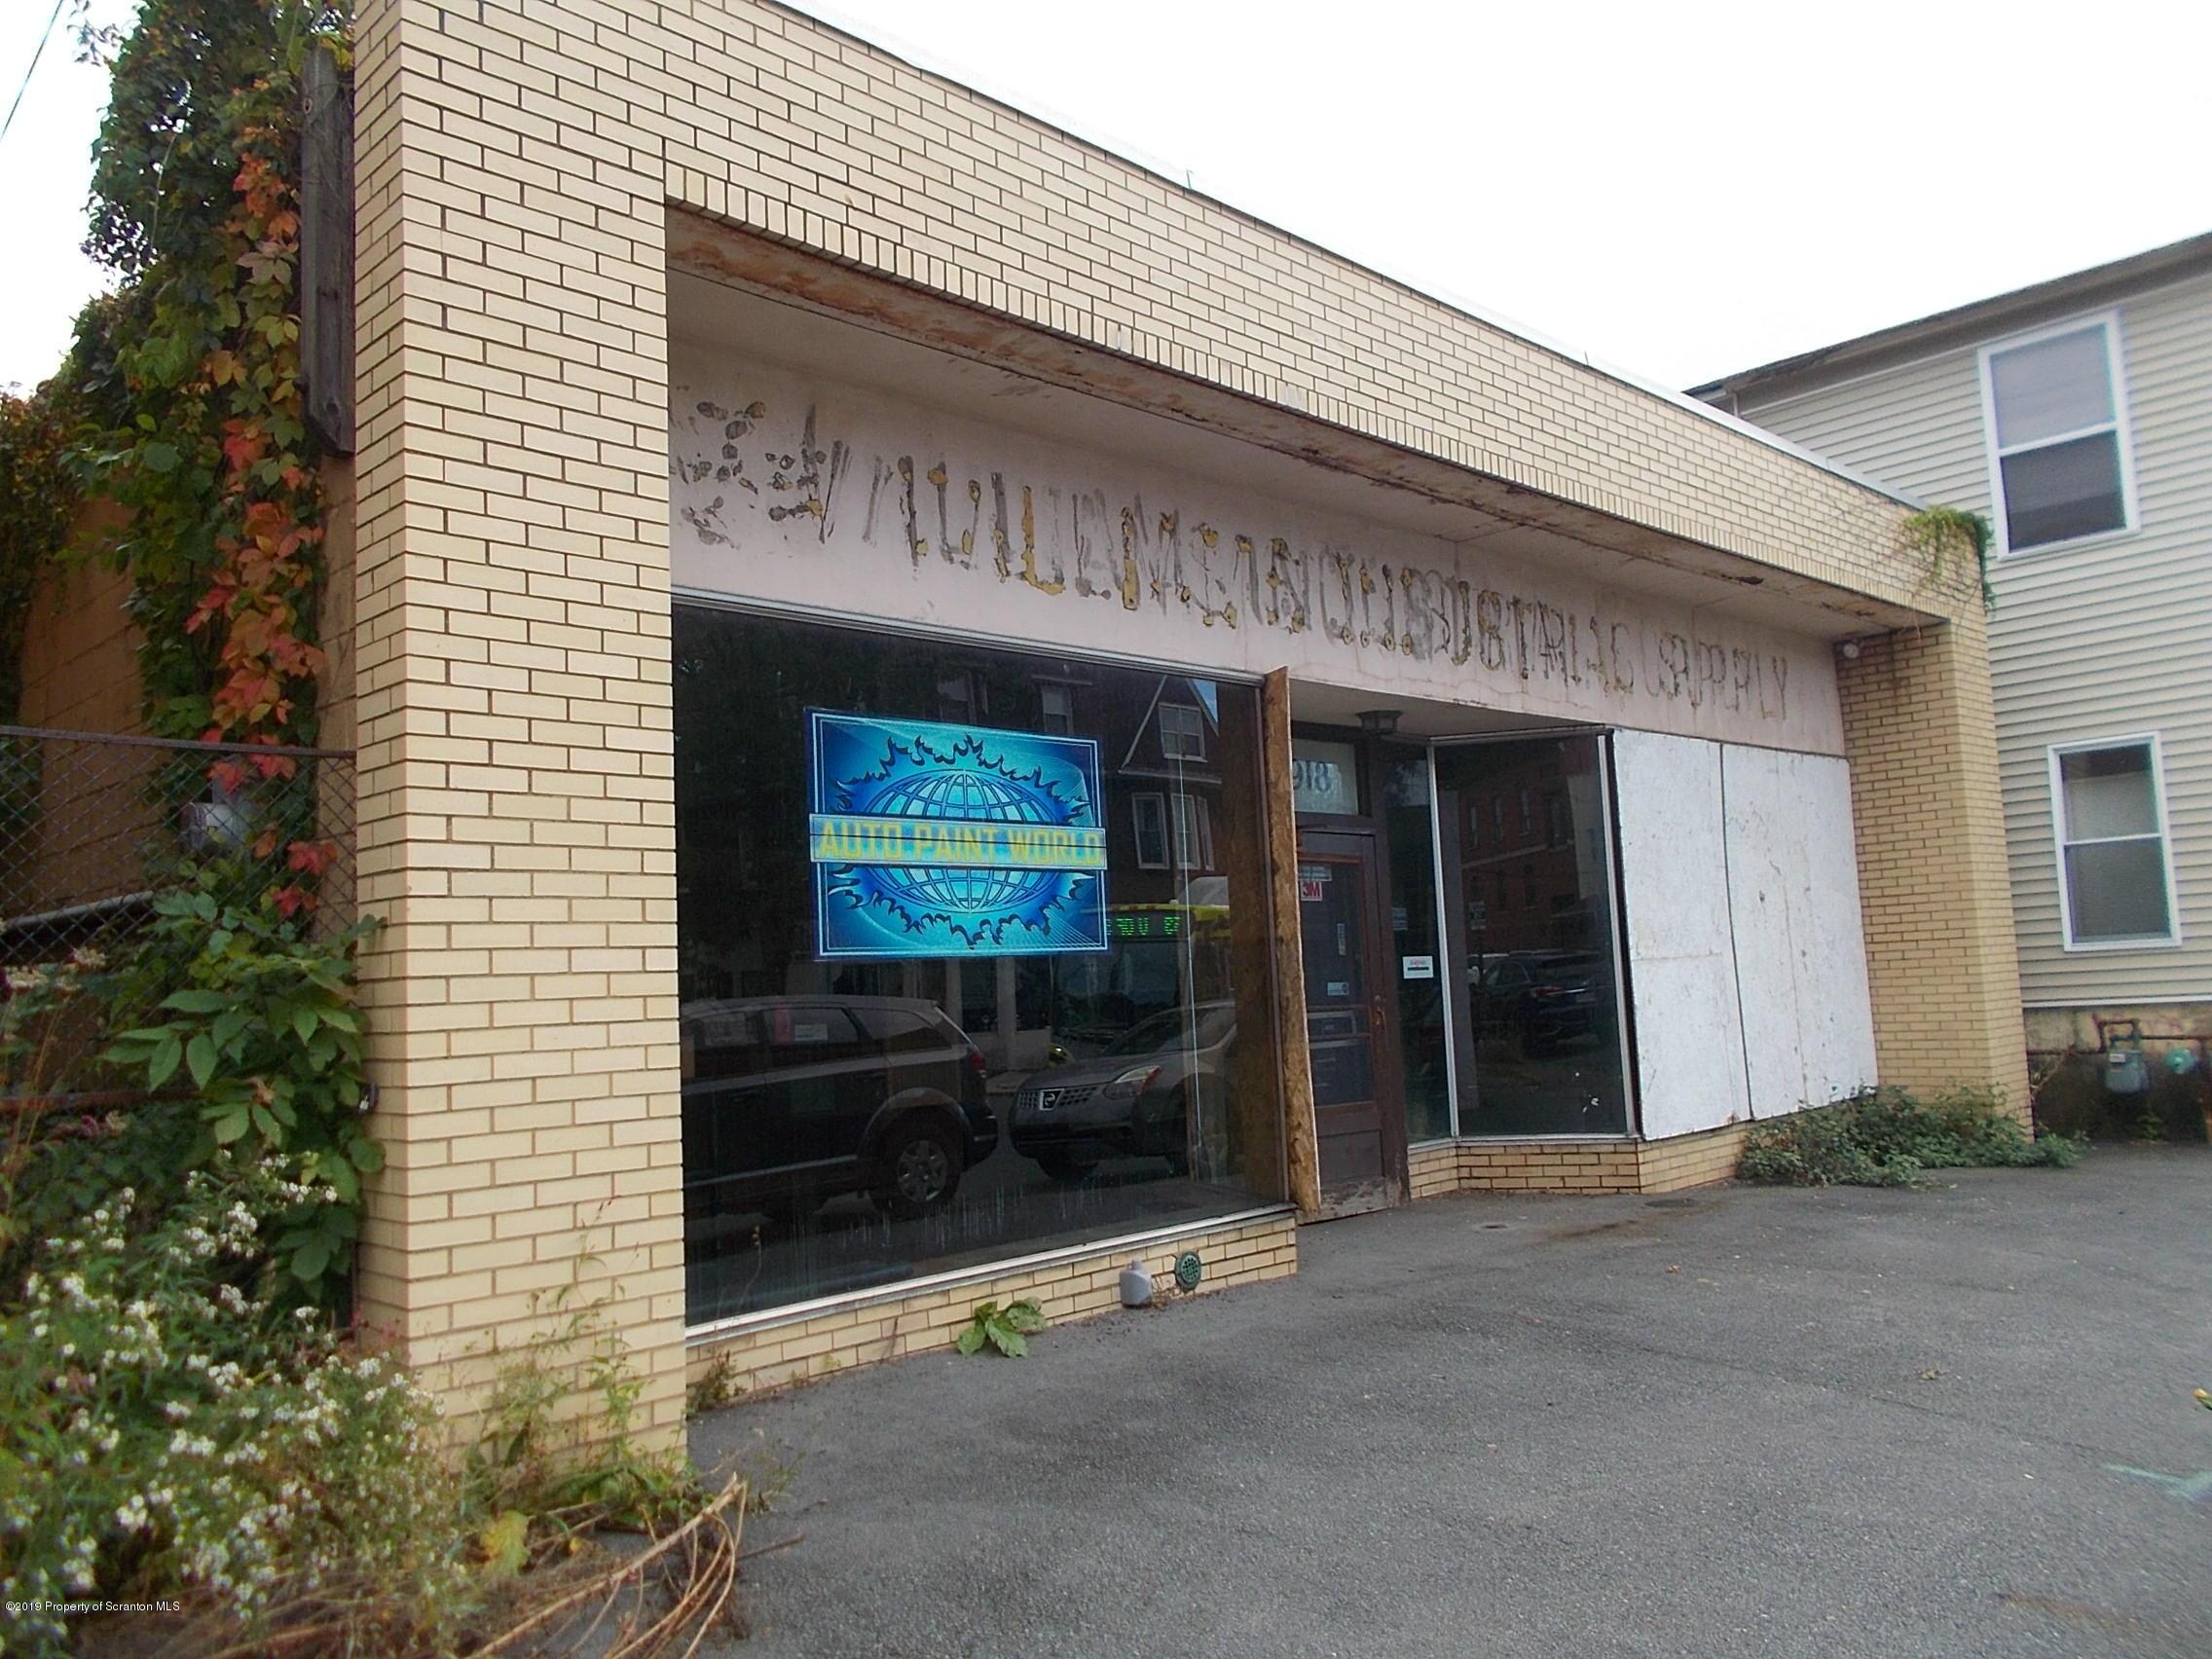 918 Washington Ave, Scranton, Pennsylvania 18509, ,2 BathroomsBathrooms,Commercial,For Sale,Washington,19-4877